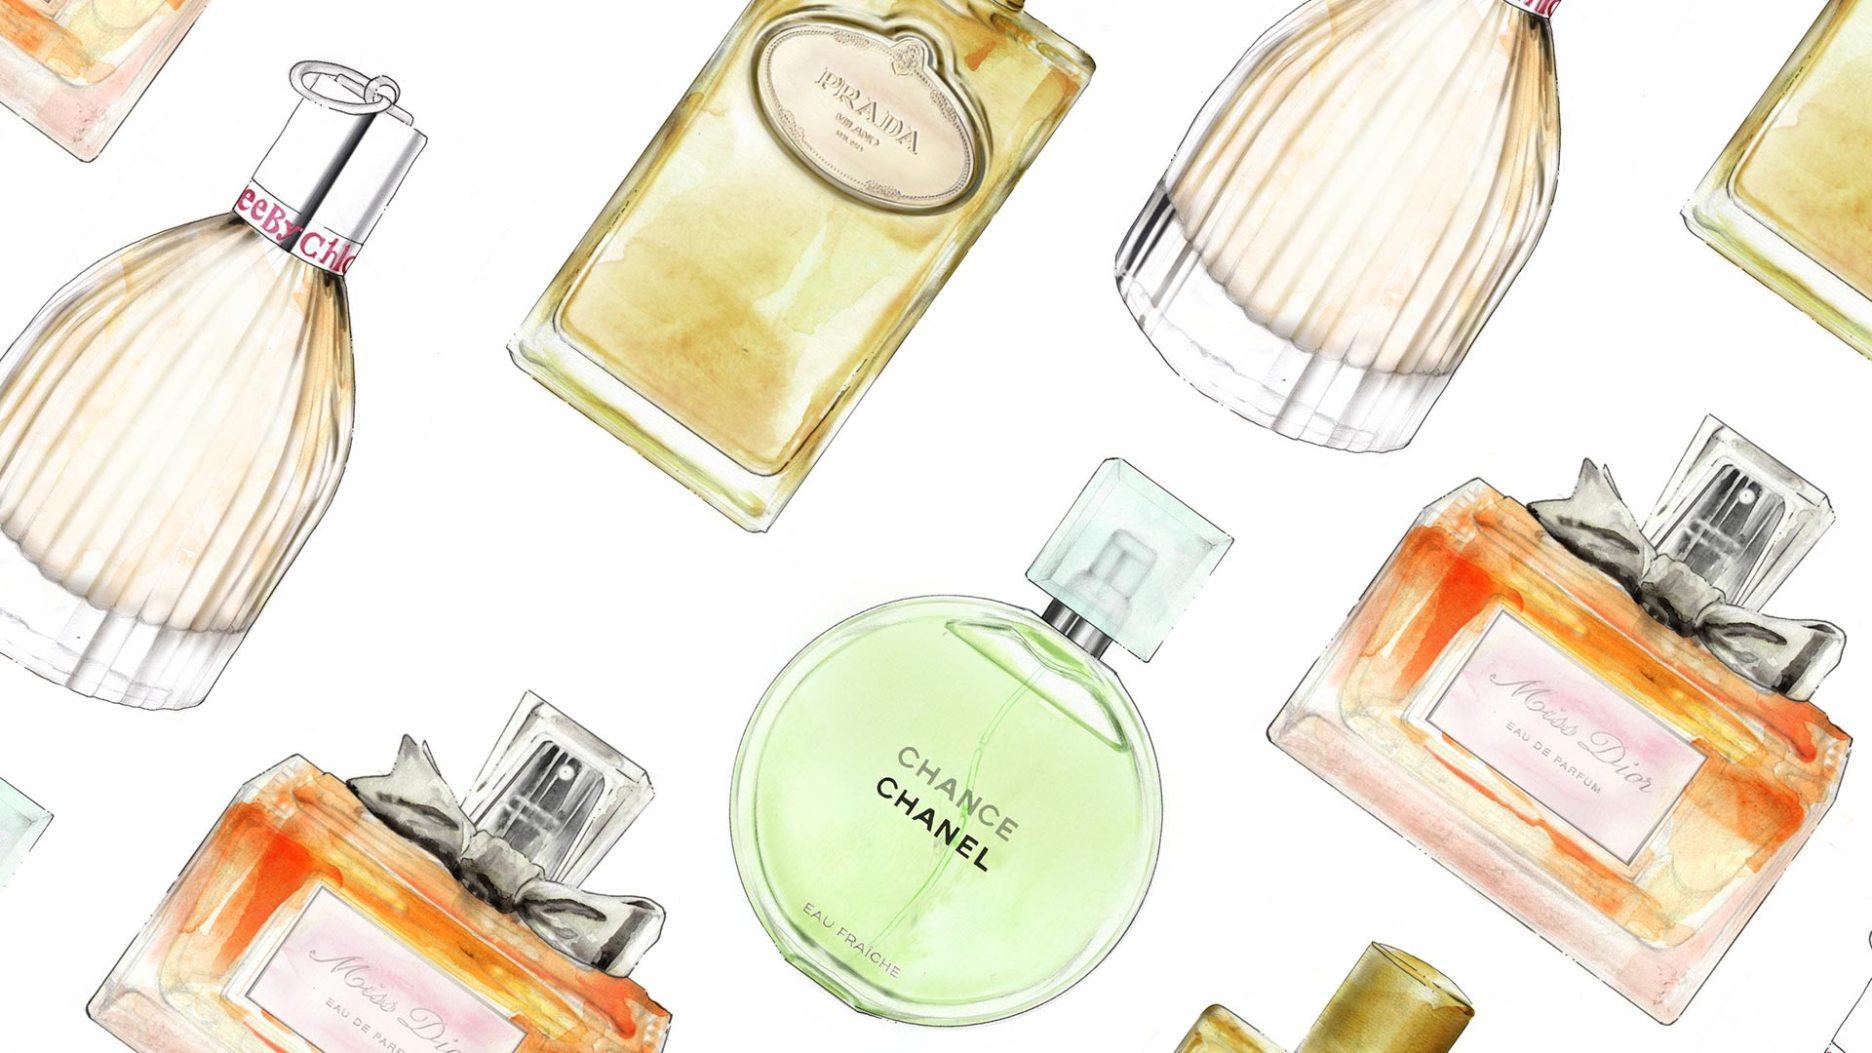 2D Perfume Bottles Beauty Product Illustration